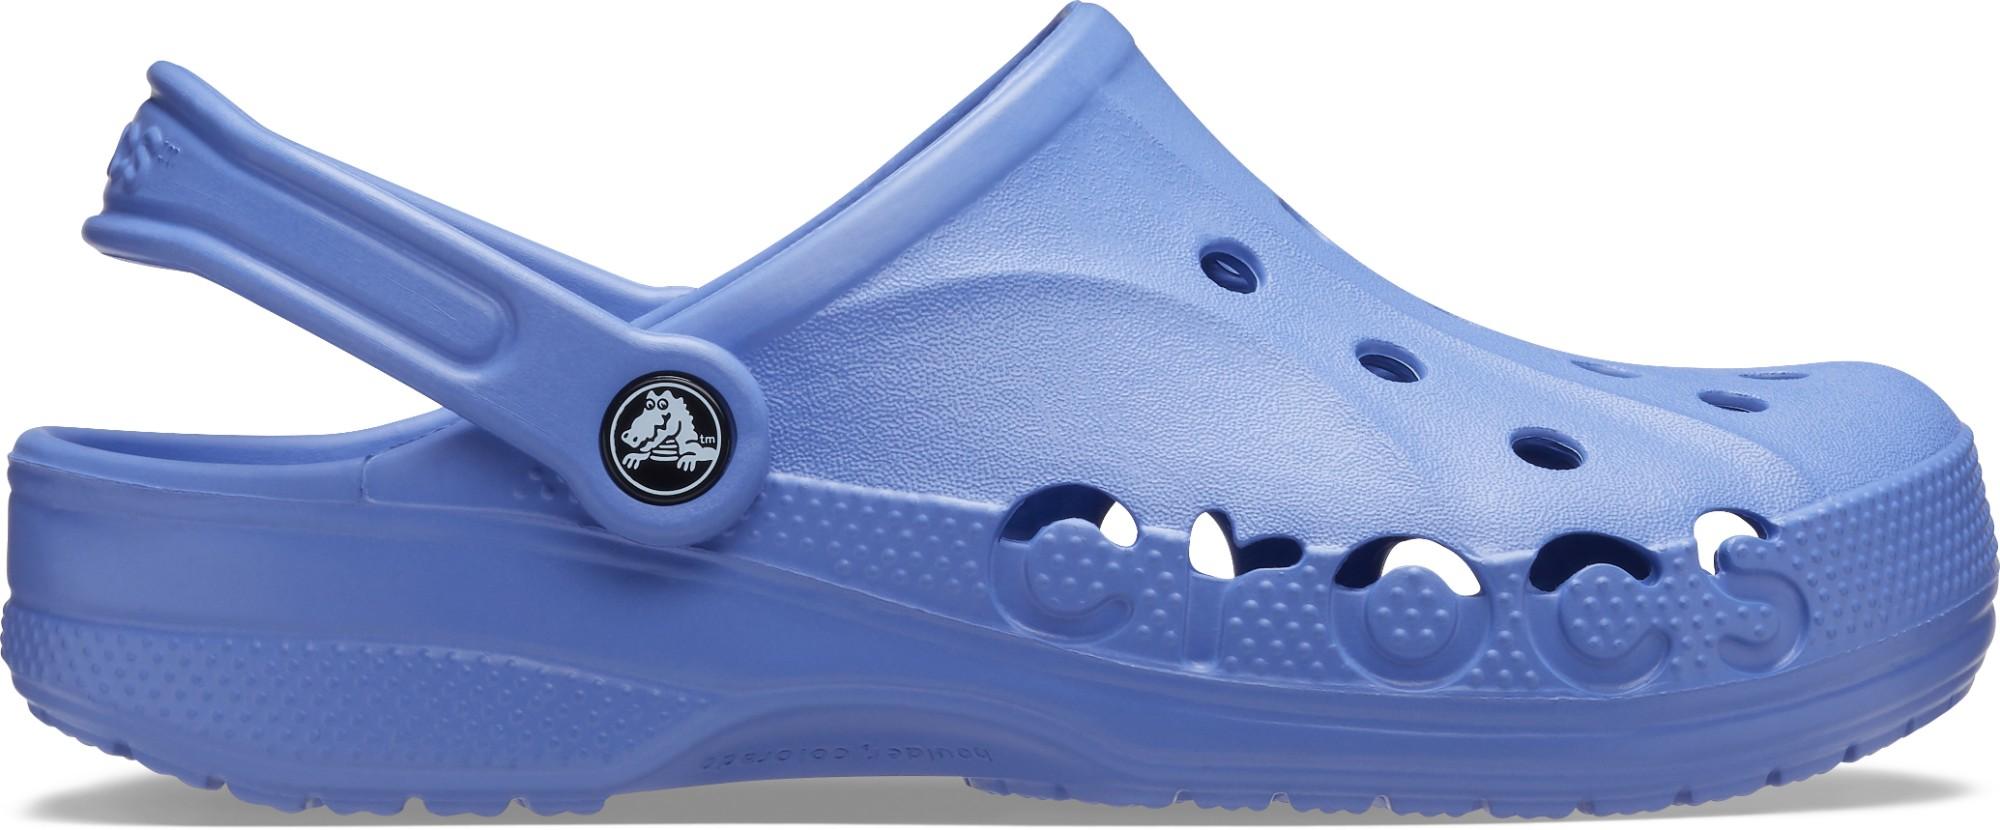 Crocs™ Baya Lapis 41